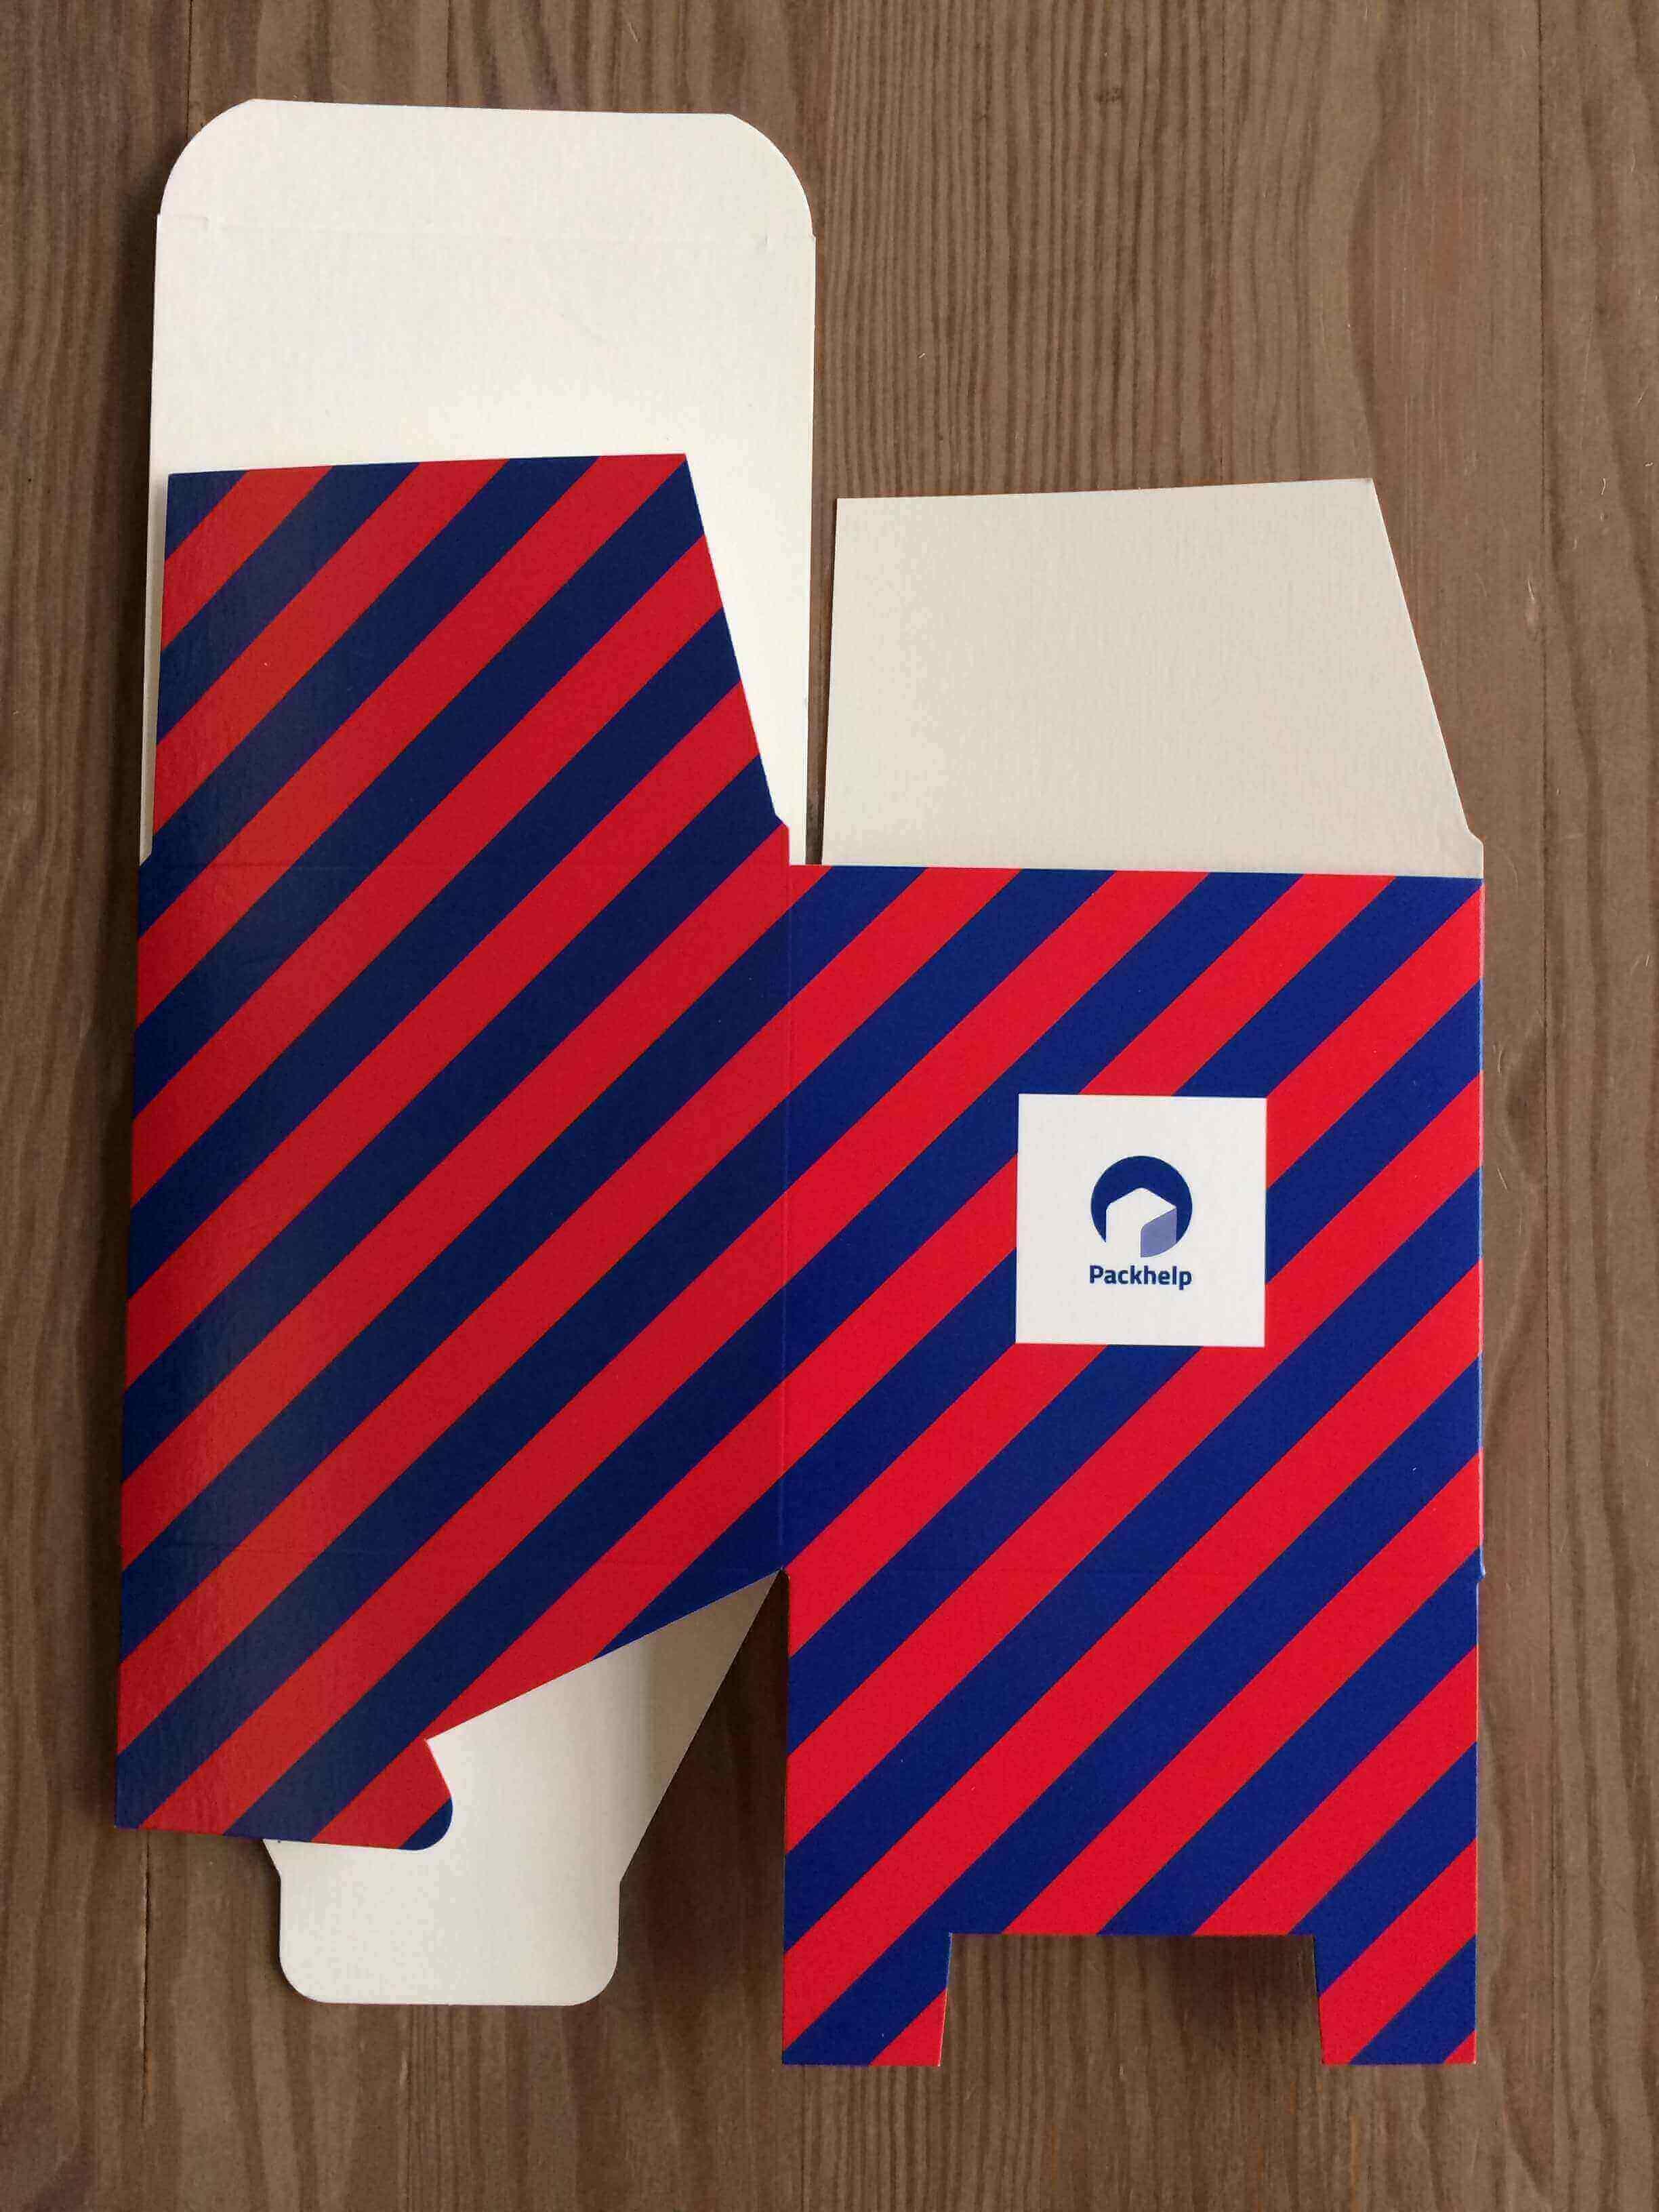 folding product boxes_packhelp_9